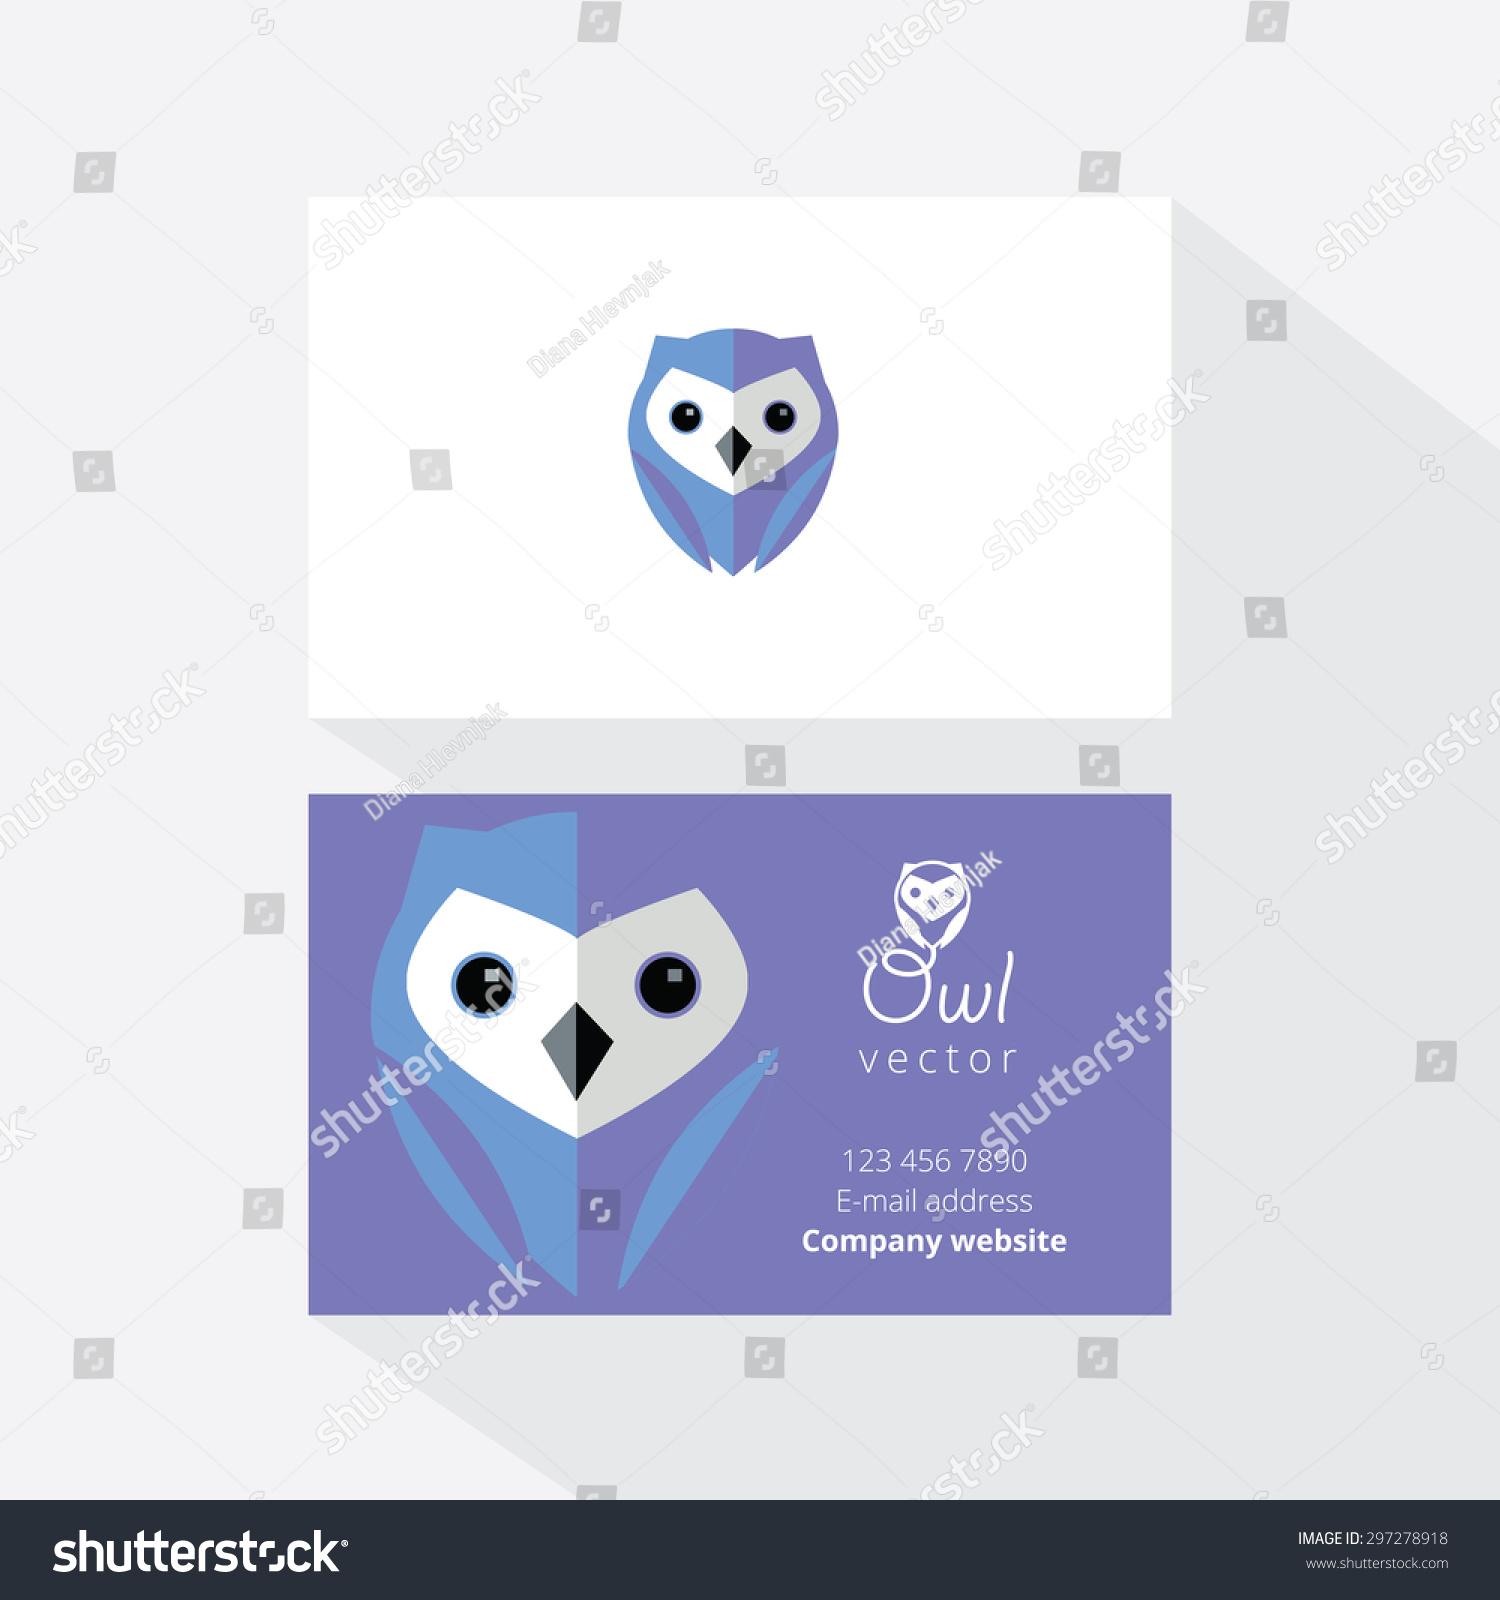 Owl Business Cards Ideas